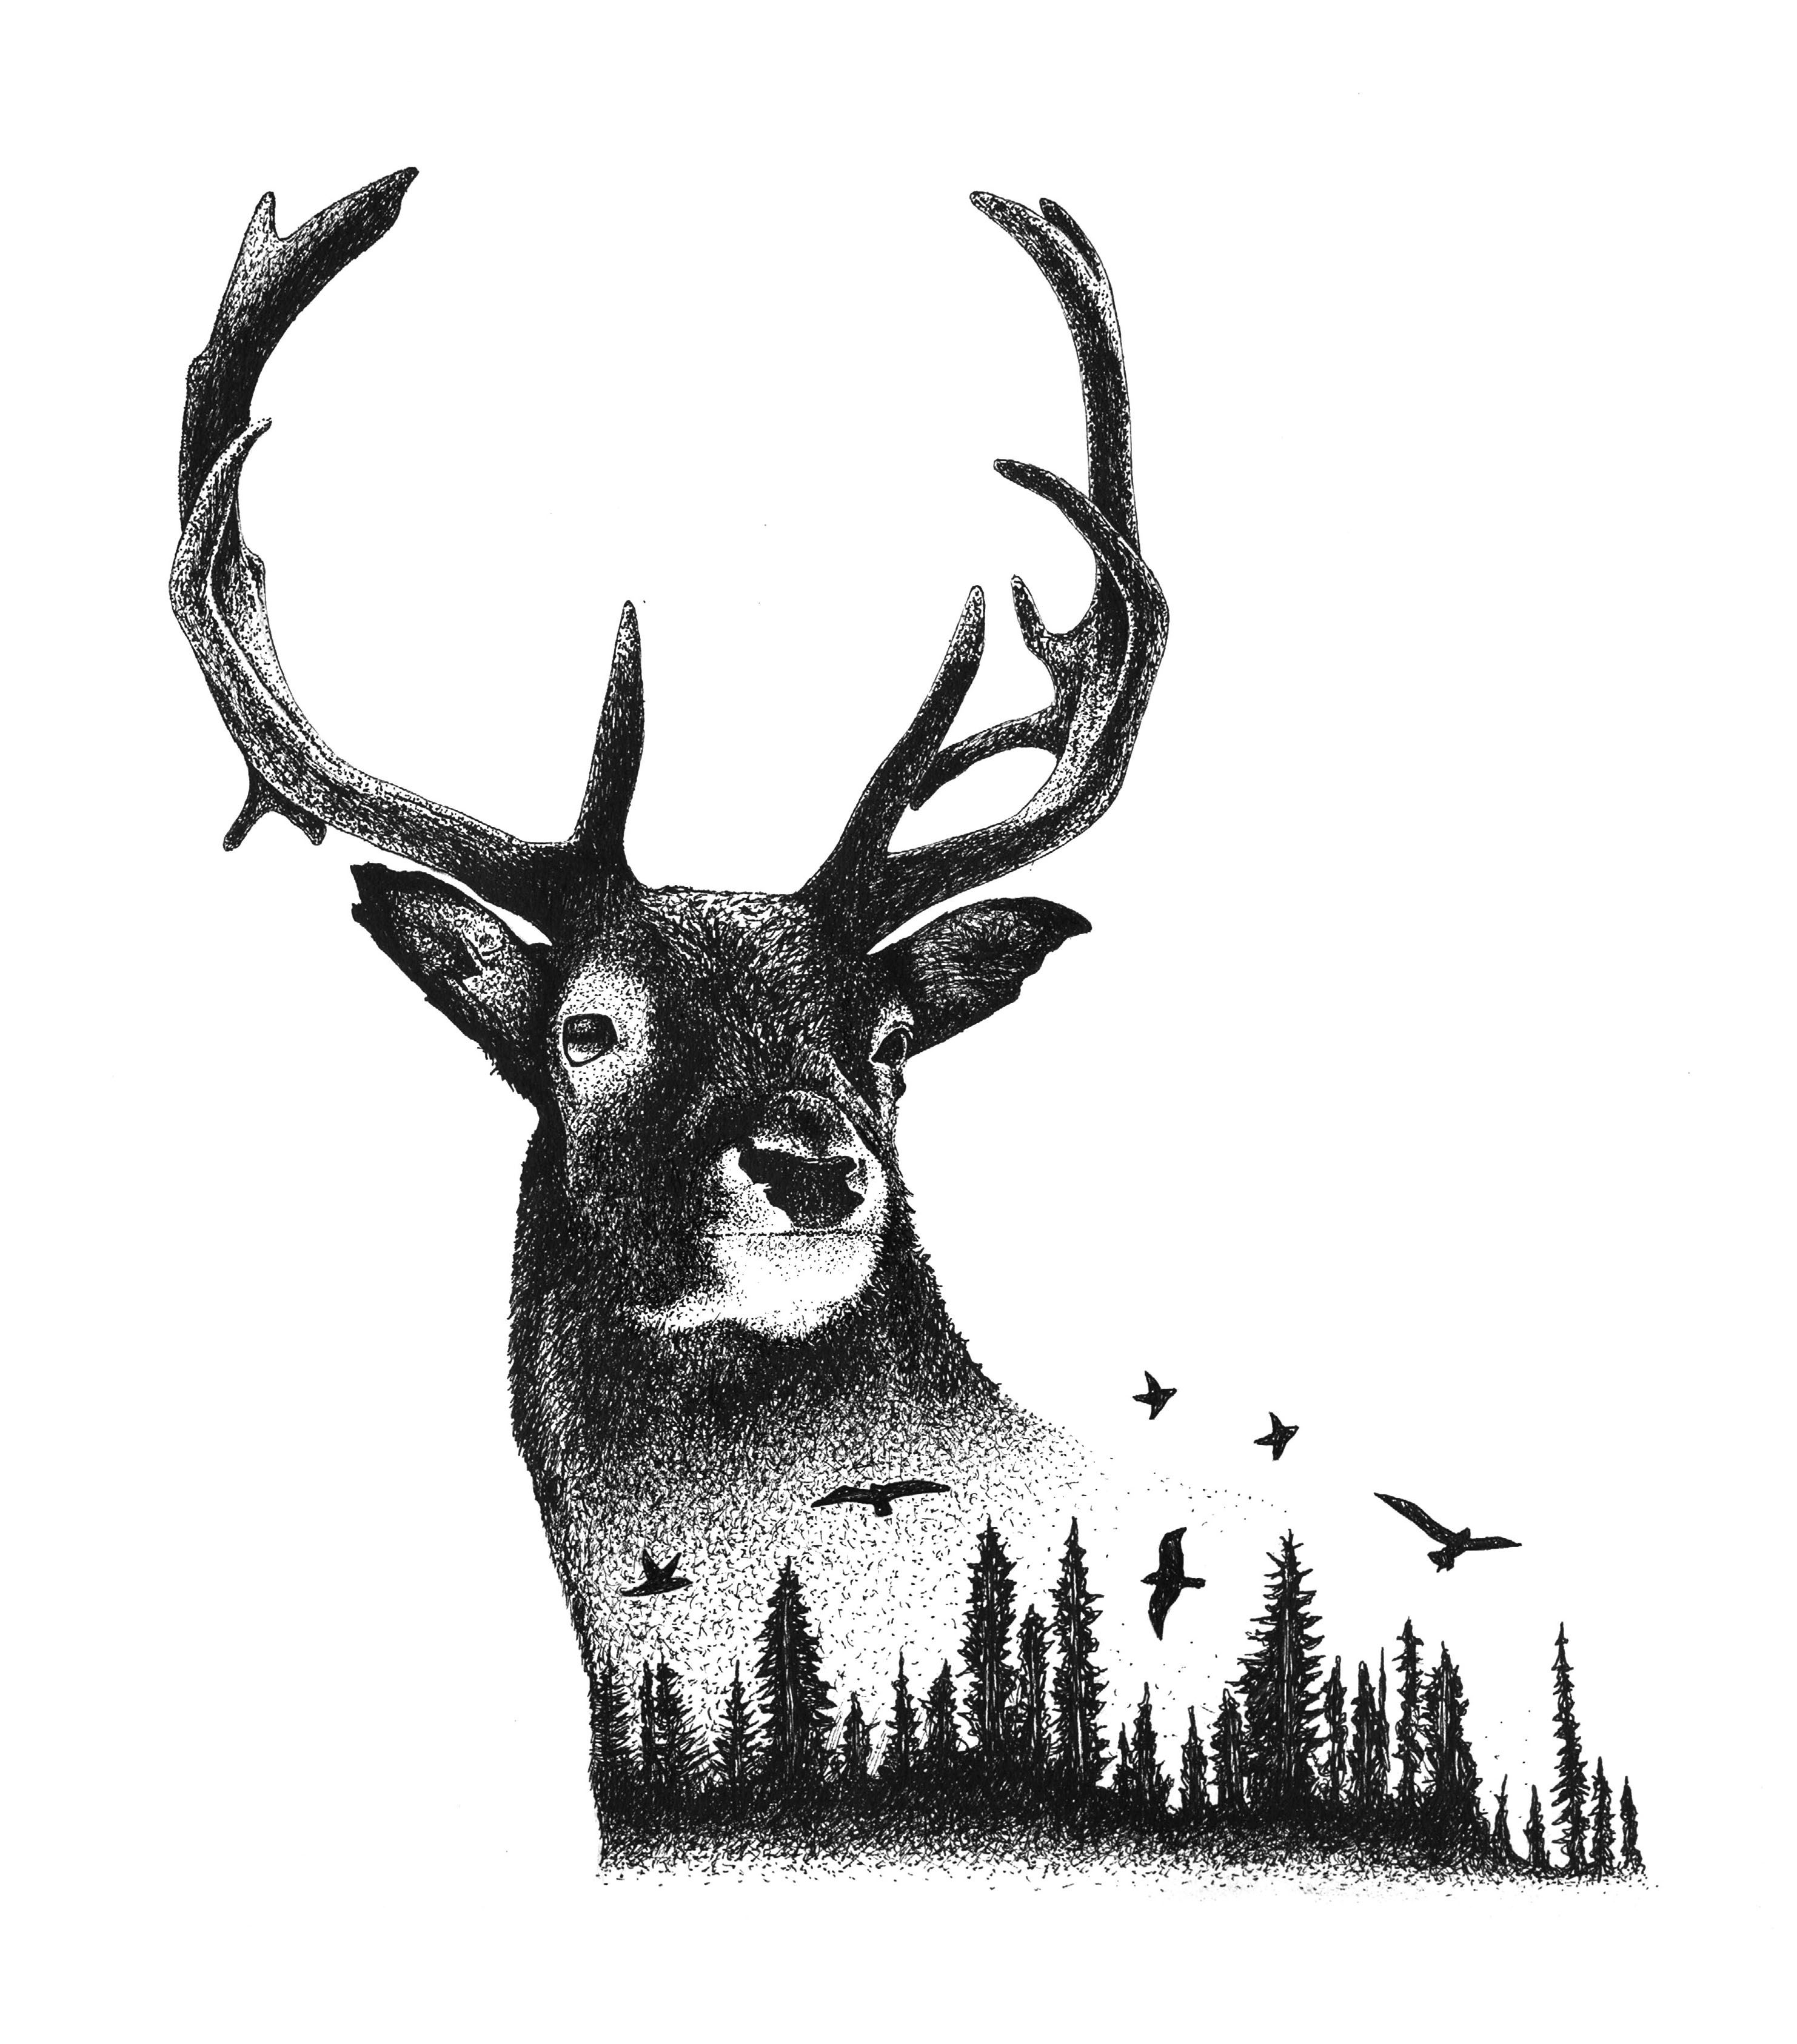 Deer Art Illustration Nature Evergreen Trees - King Of Forest Acedesignbyalek